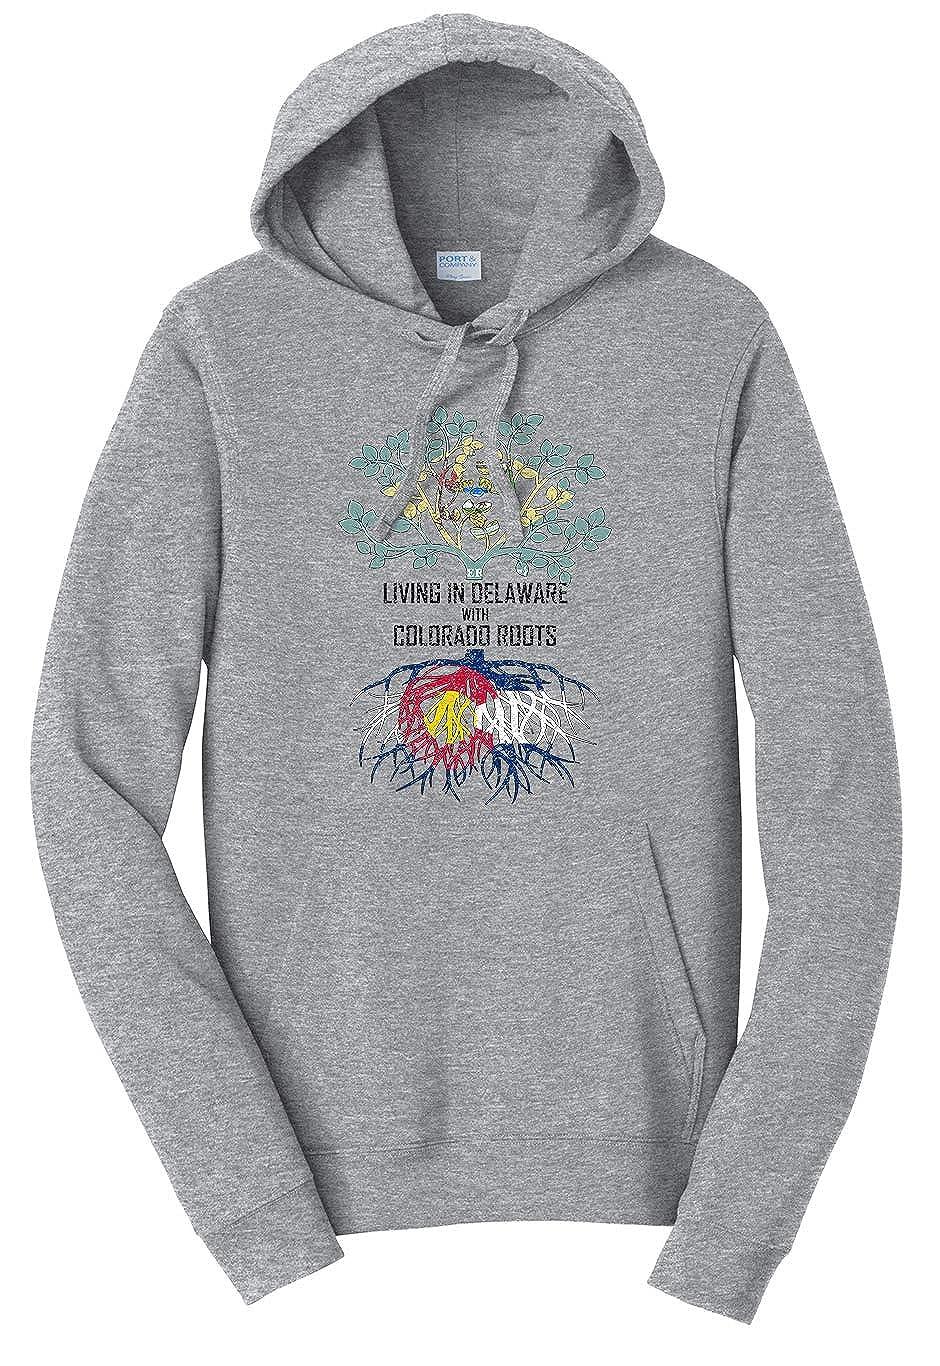 Tenacitee Girls Living in Delaware with Virginia Roots Hooded Sweatshirt